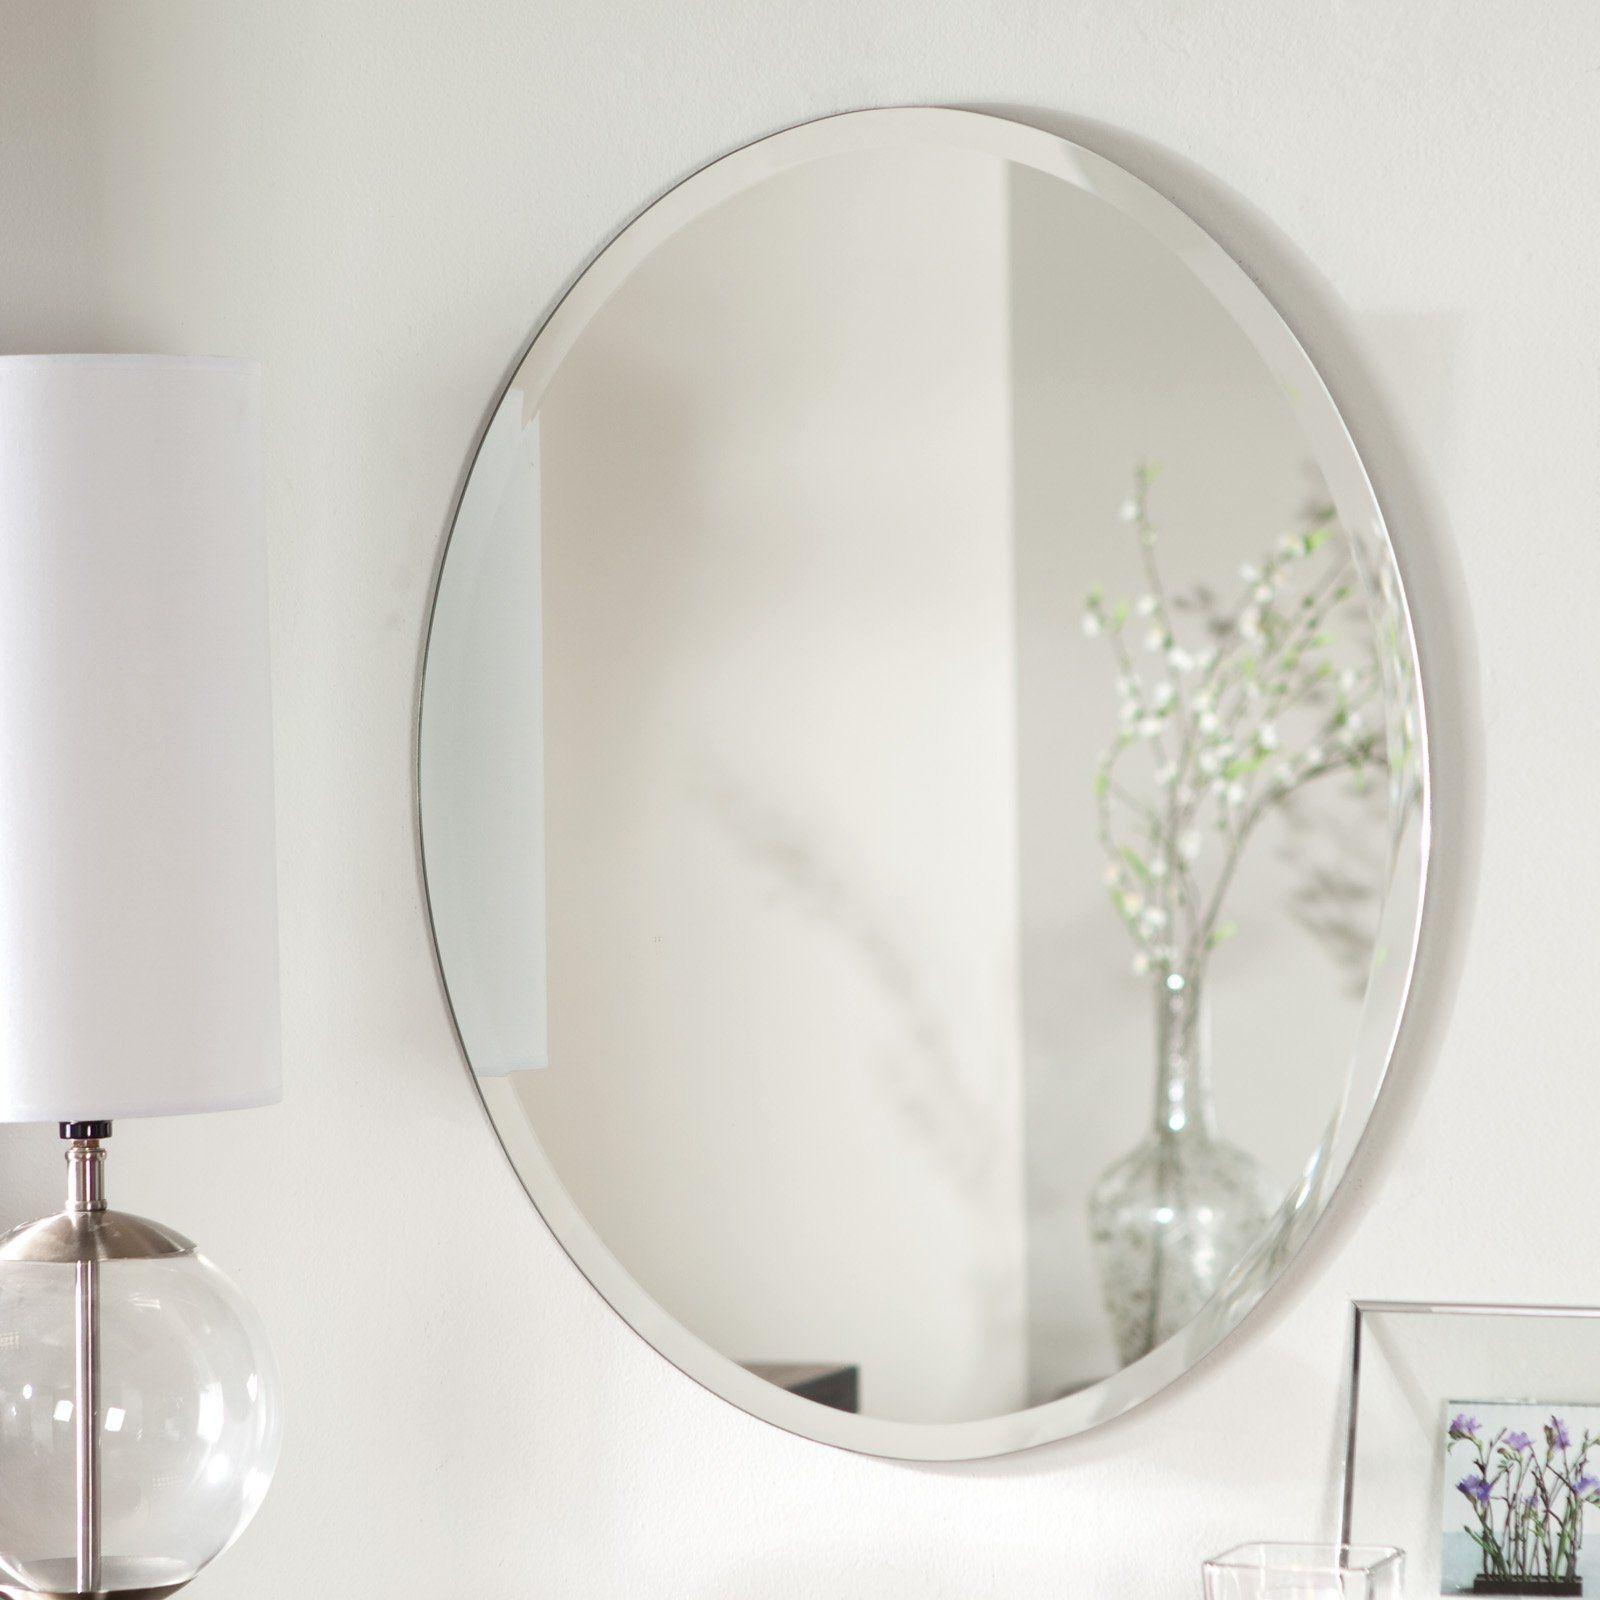 Large Oval Frameless Wall Mirror | http://drrw.us | Pinterest ...